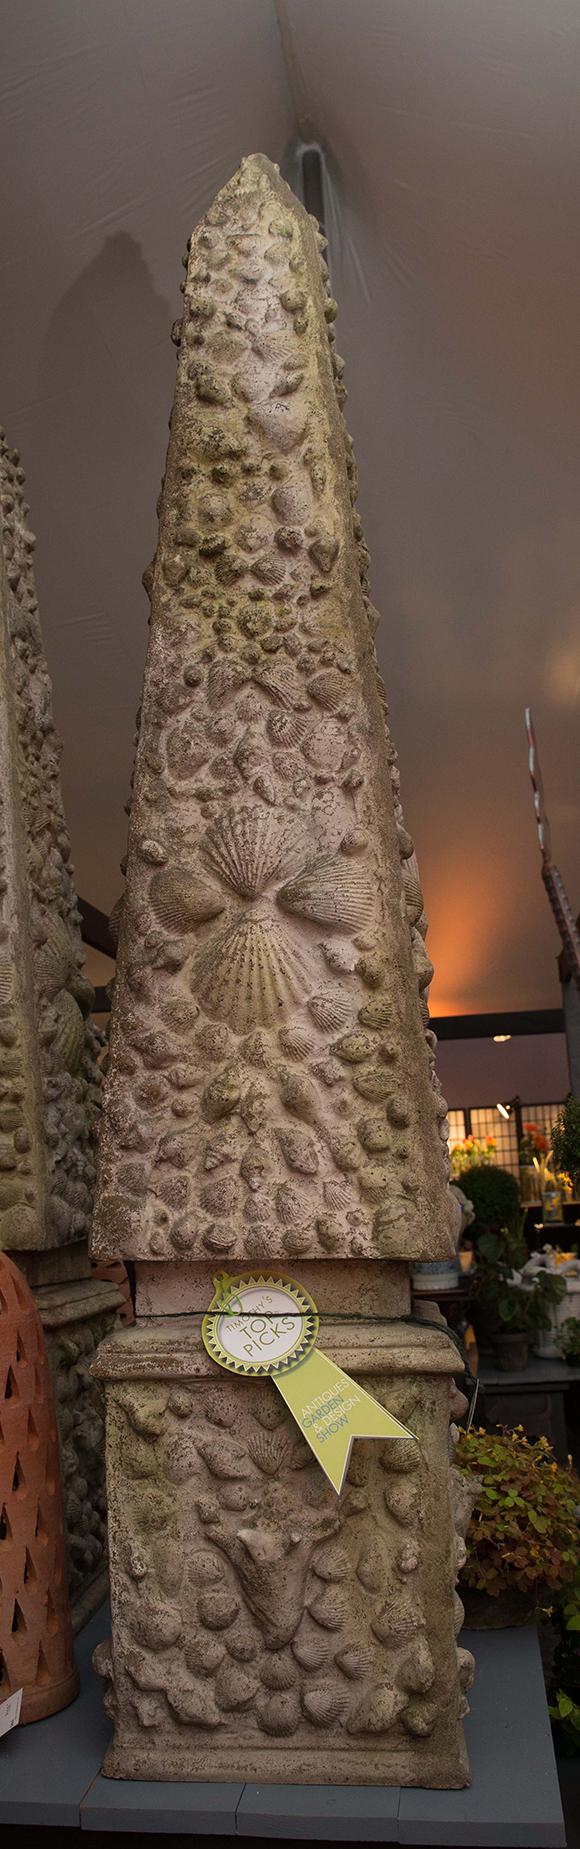 Booth #310, Craig Bergmann Landscape Design: A towering garden obelisk with raised shell motif.